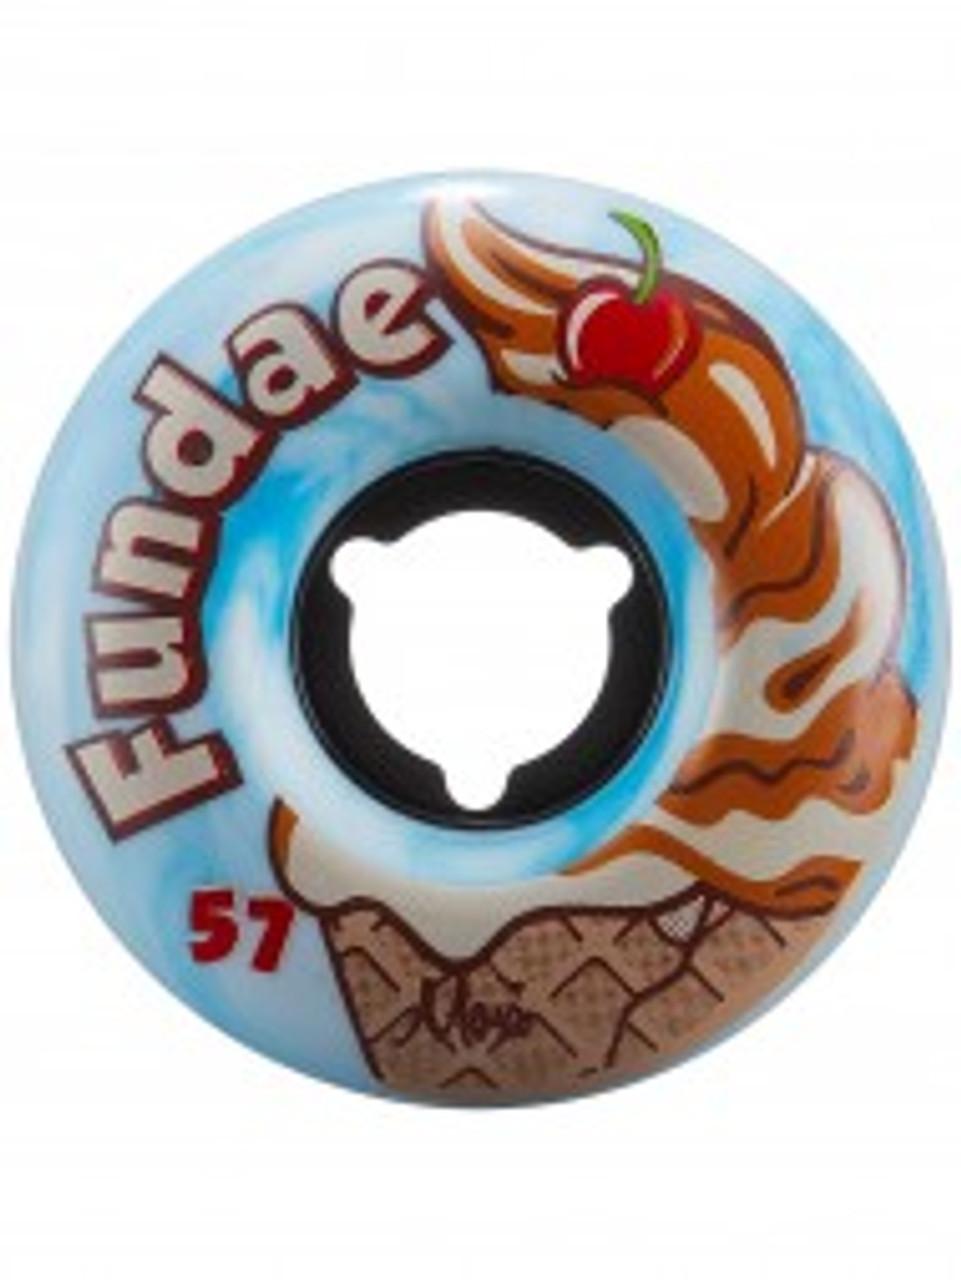 Moxi Fundae Wheels